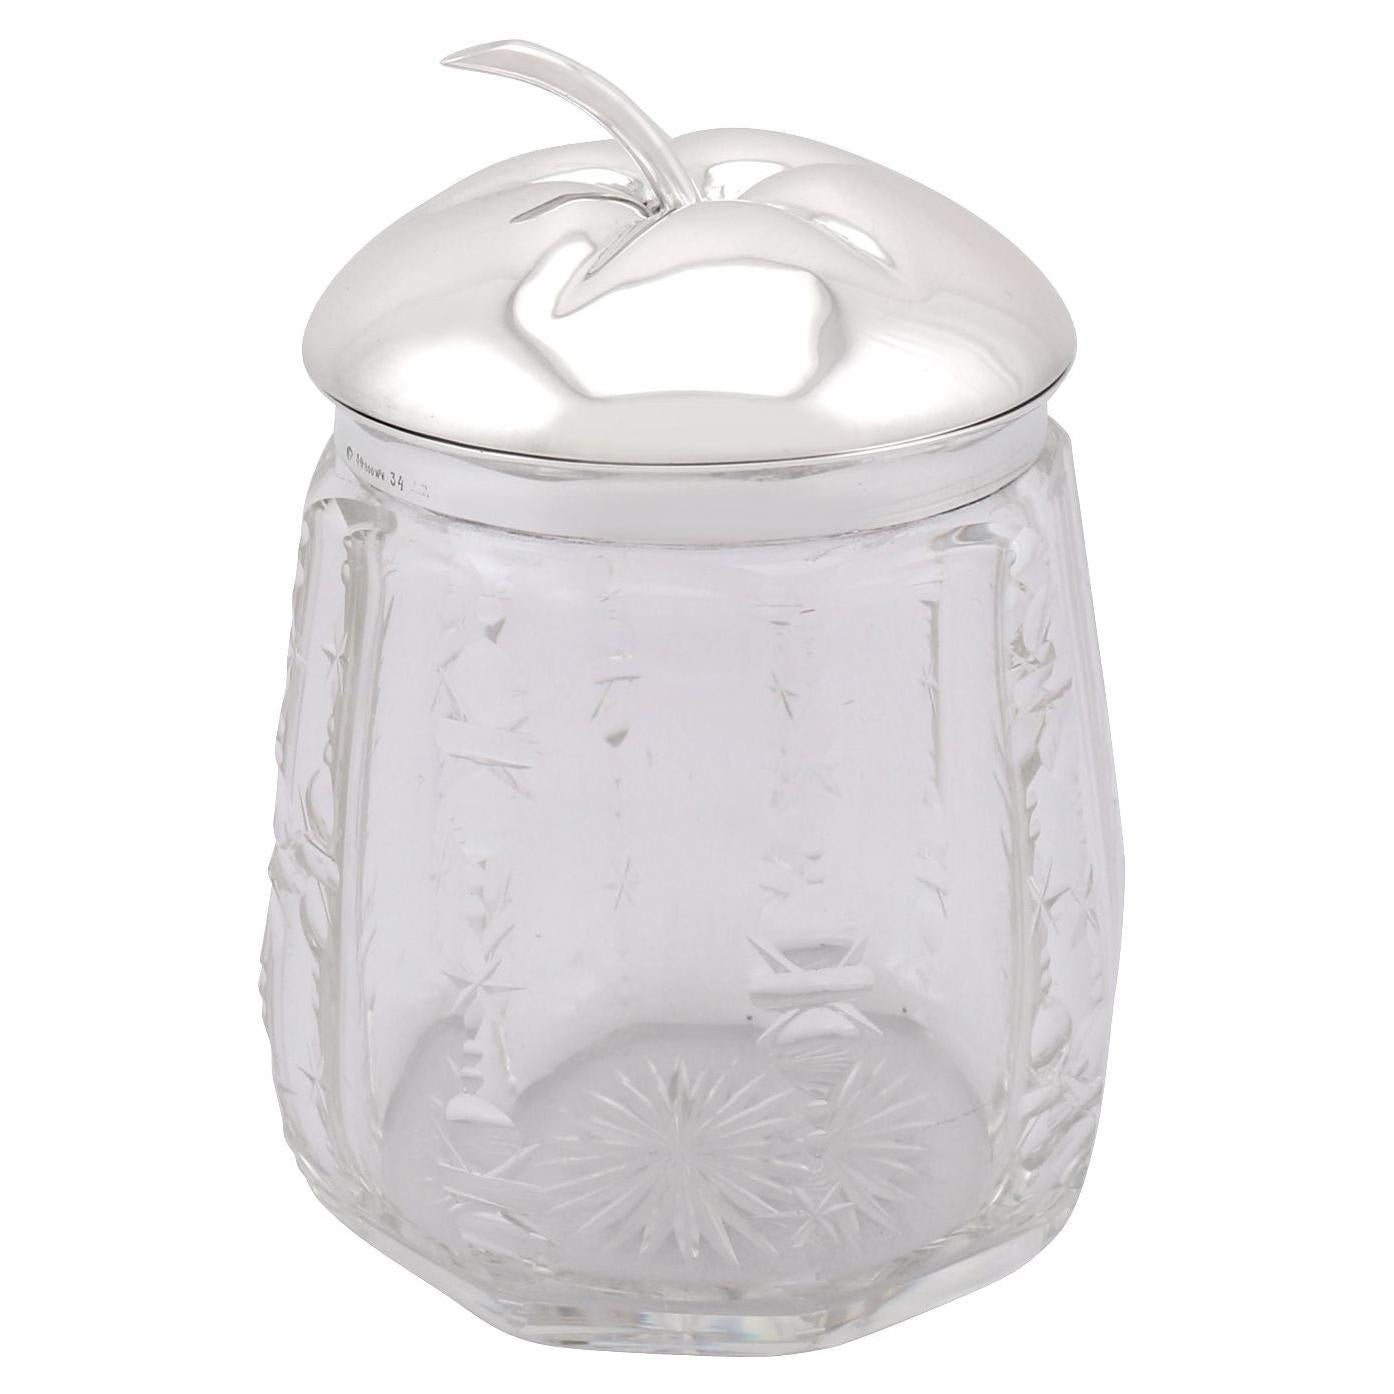 Antique German Silver and Cut Glass Jar, Circa 1930